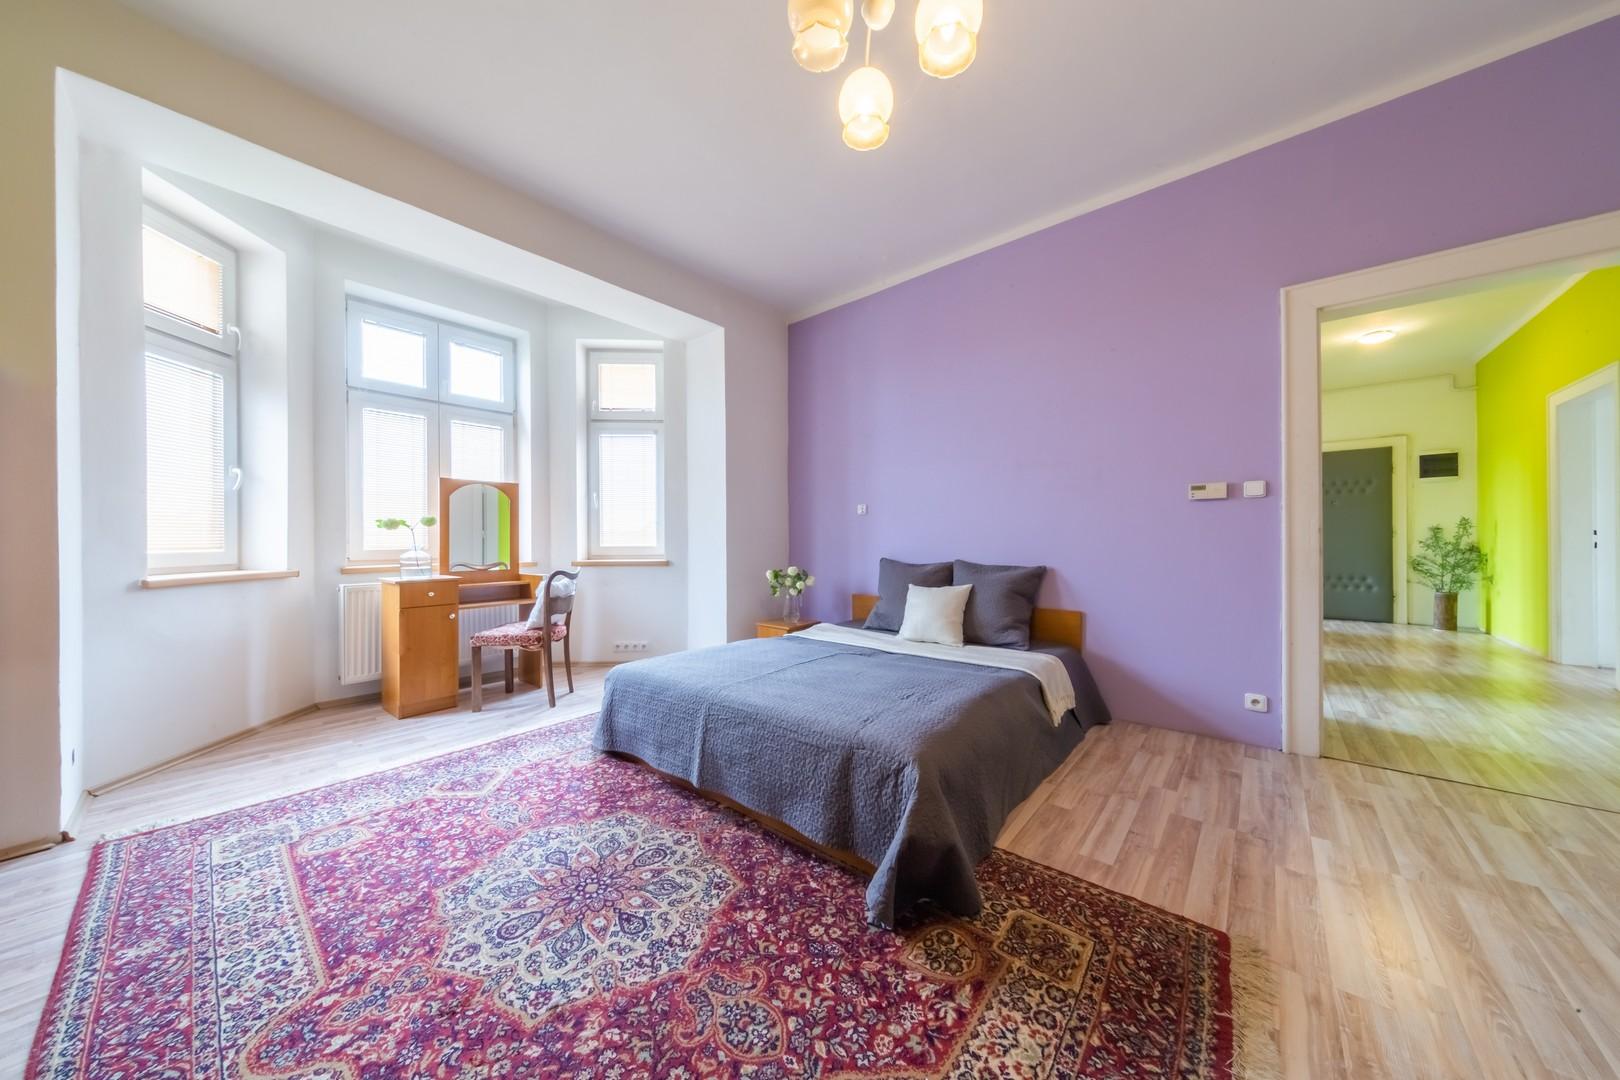 loznice postel okno podlaha dvere zidle svetlo